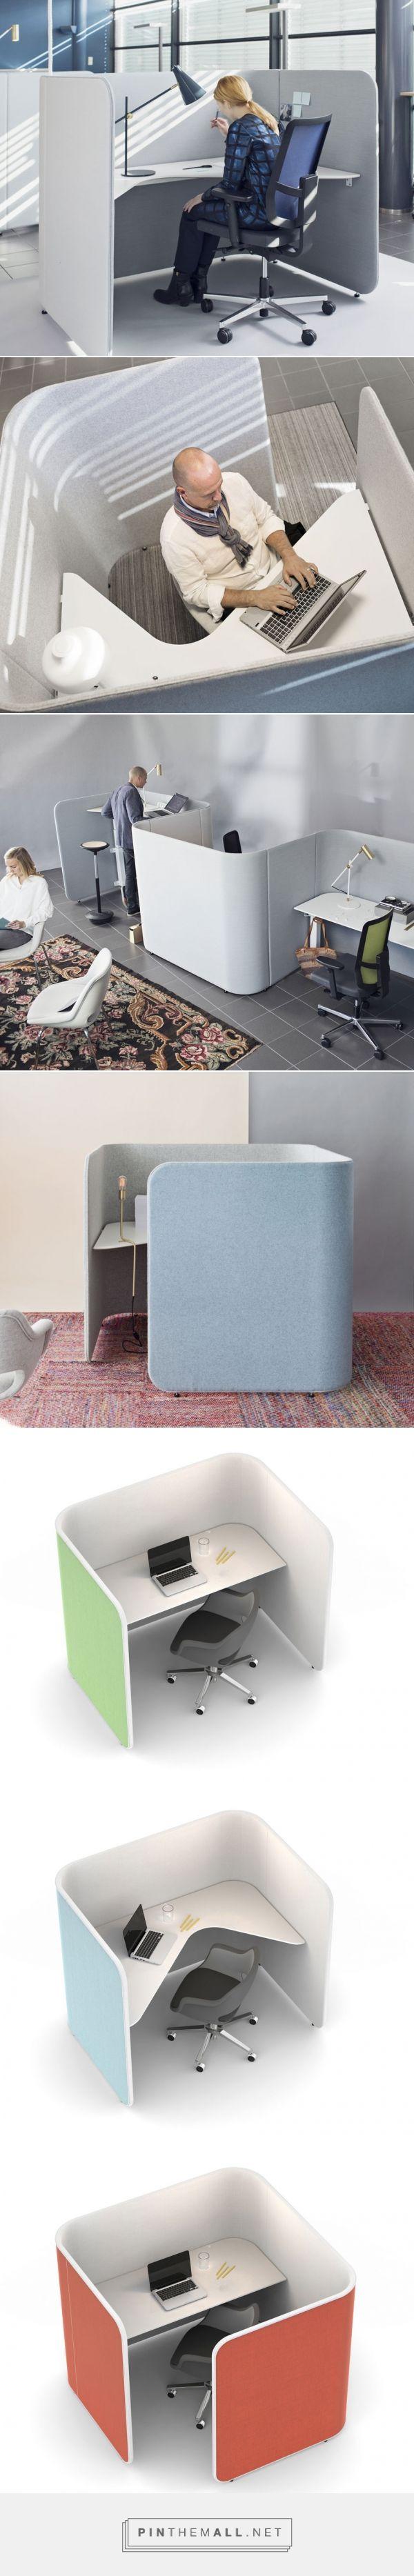 internal office pods. Pod Workstation | Office Furniture Wharfside - Created Via Http://pinthemall. Internal Pods